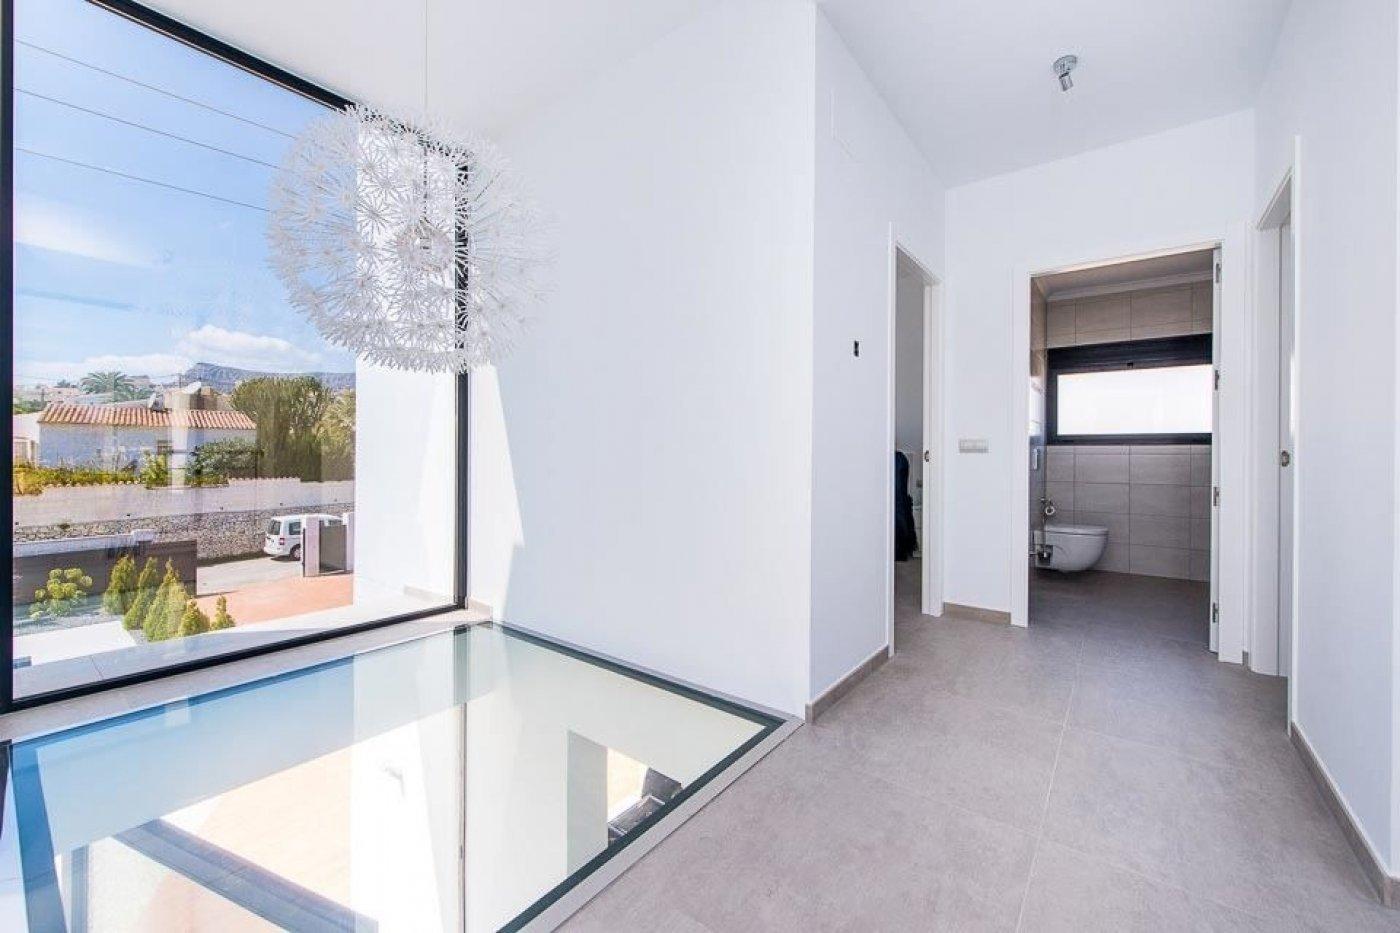 New villa with hypermodern design in Calpe